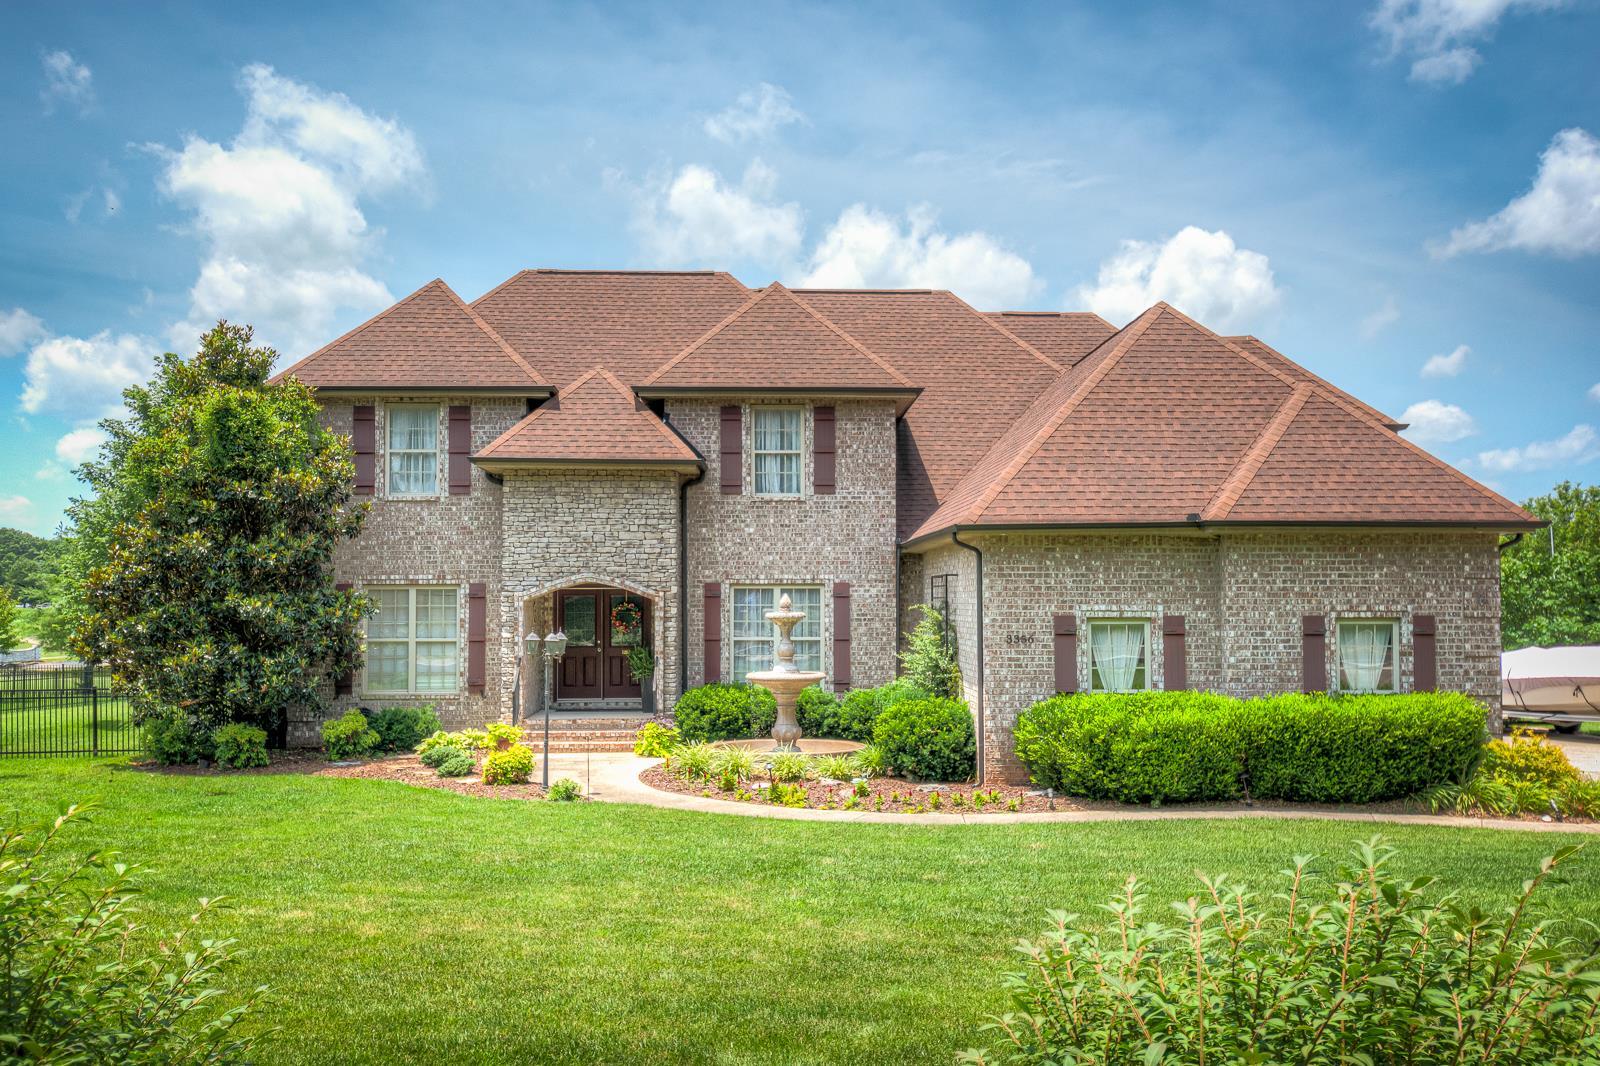 3356 Allen Barrett Rd, Murfreesboro, TN 37129 - Murfreesboro, TN real estate listing